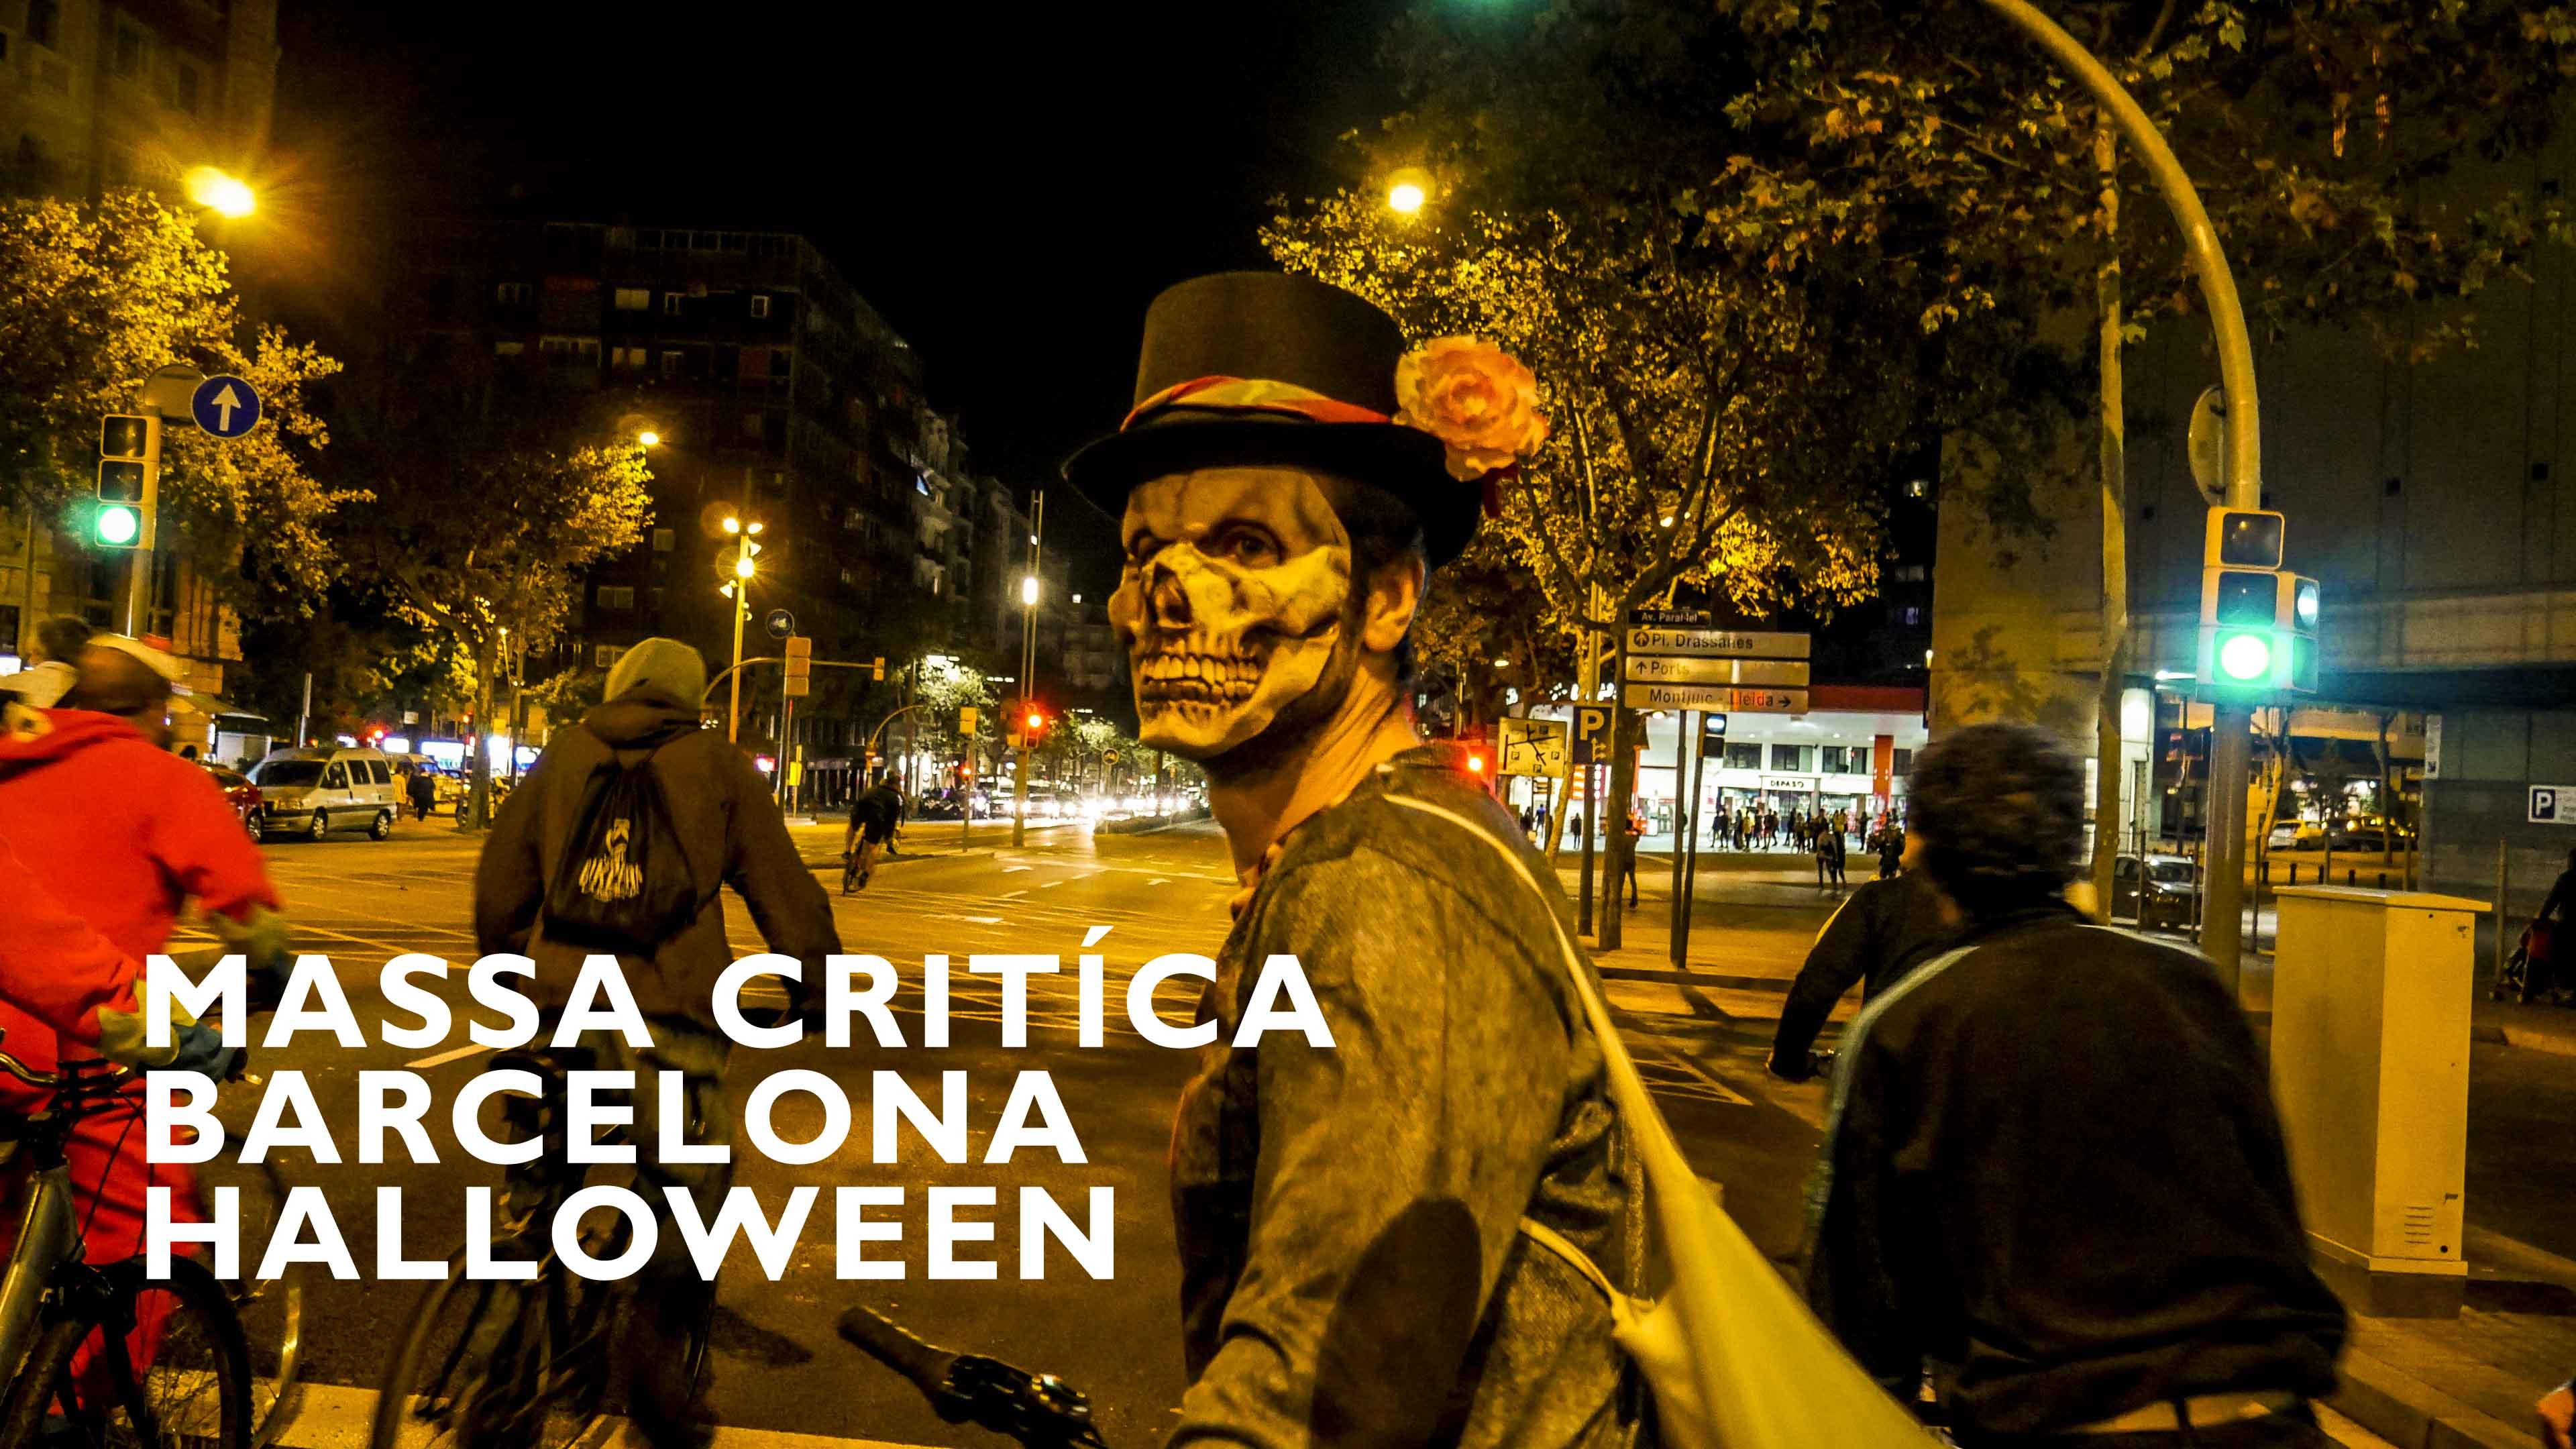 Massa Critíca Barcelona Halloween 2016